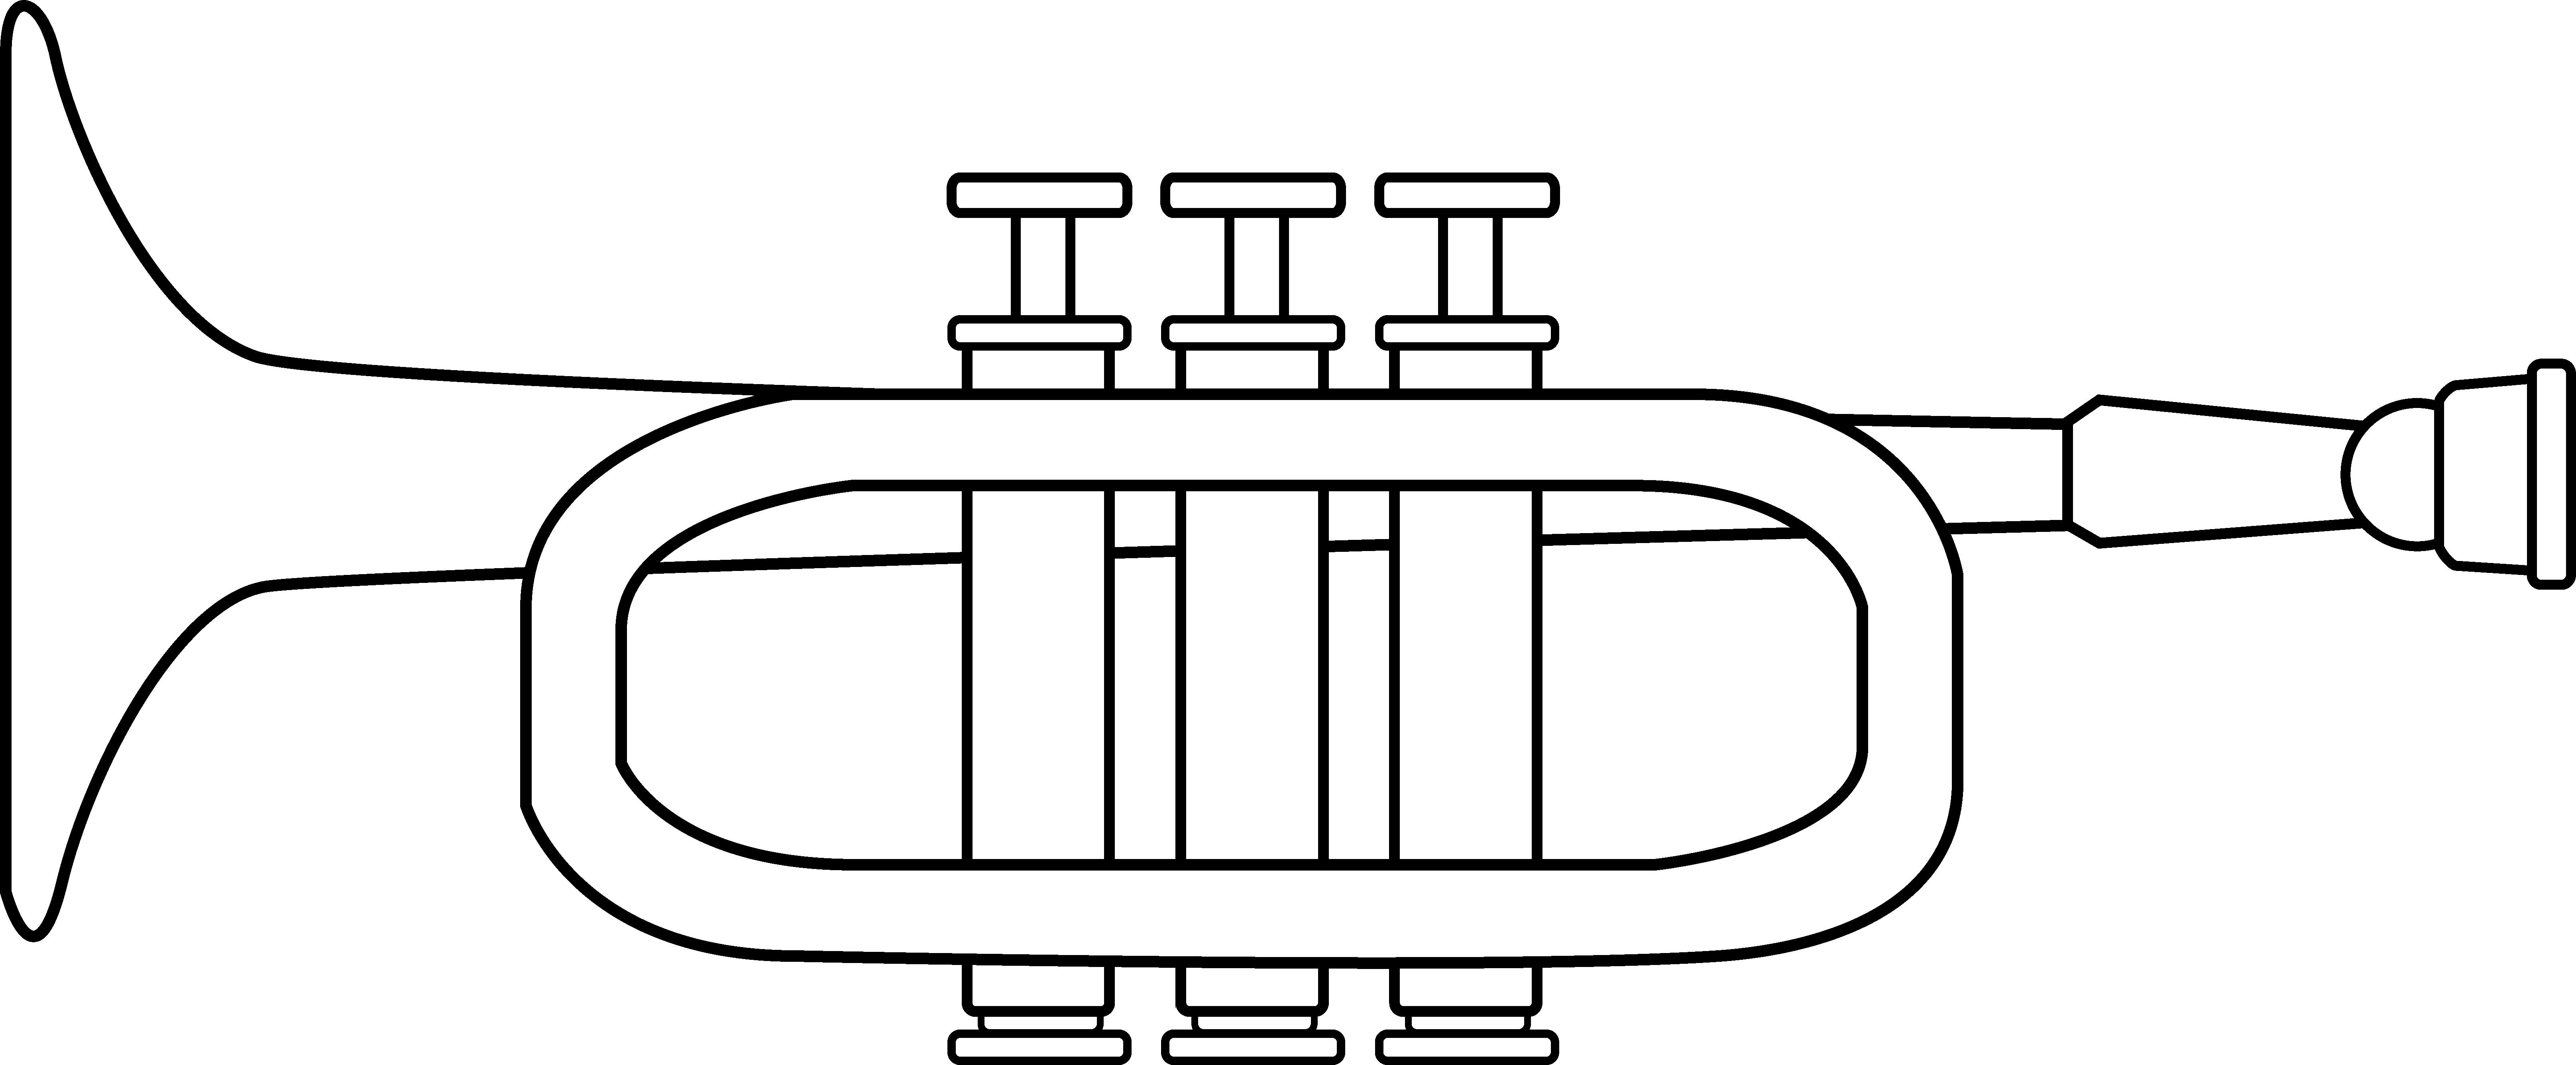 Trumpet Coloring Page Free Clip Art-Trumpet coloring page free clip art-15